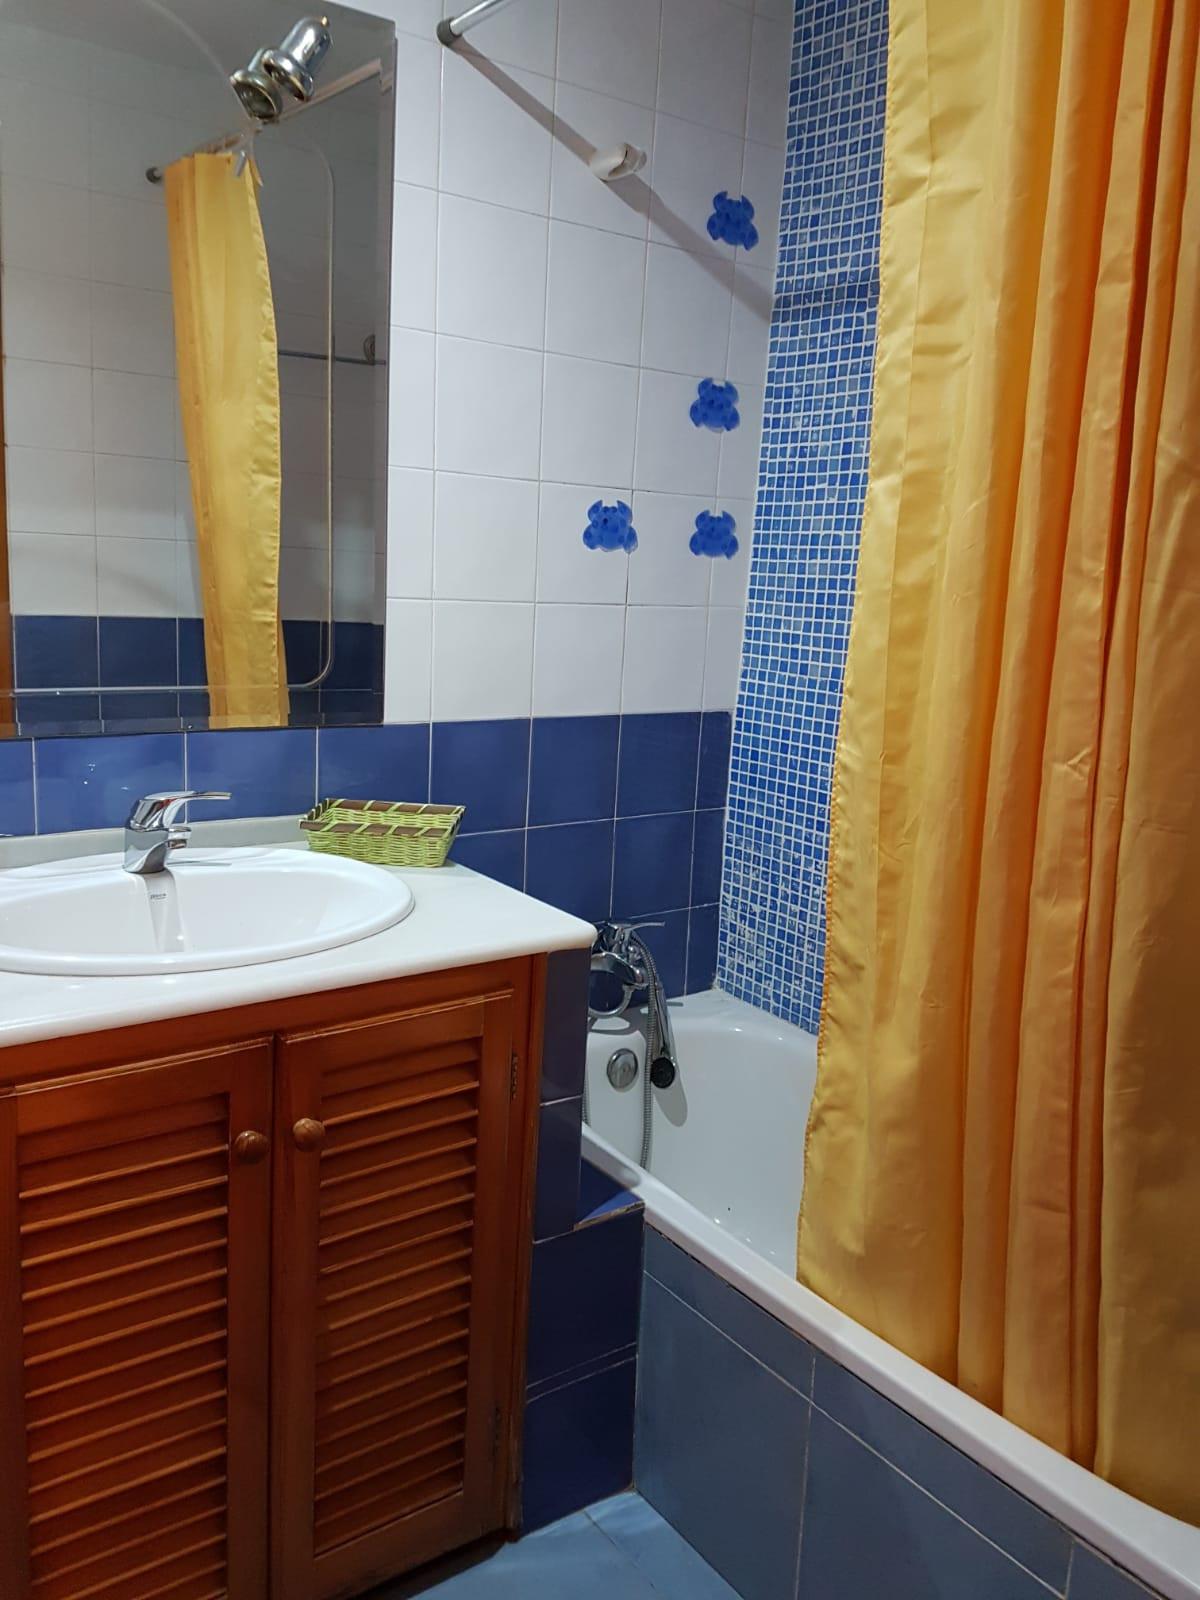 R3196780: Apartment for sale in Estepona